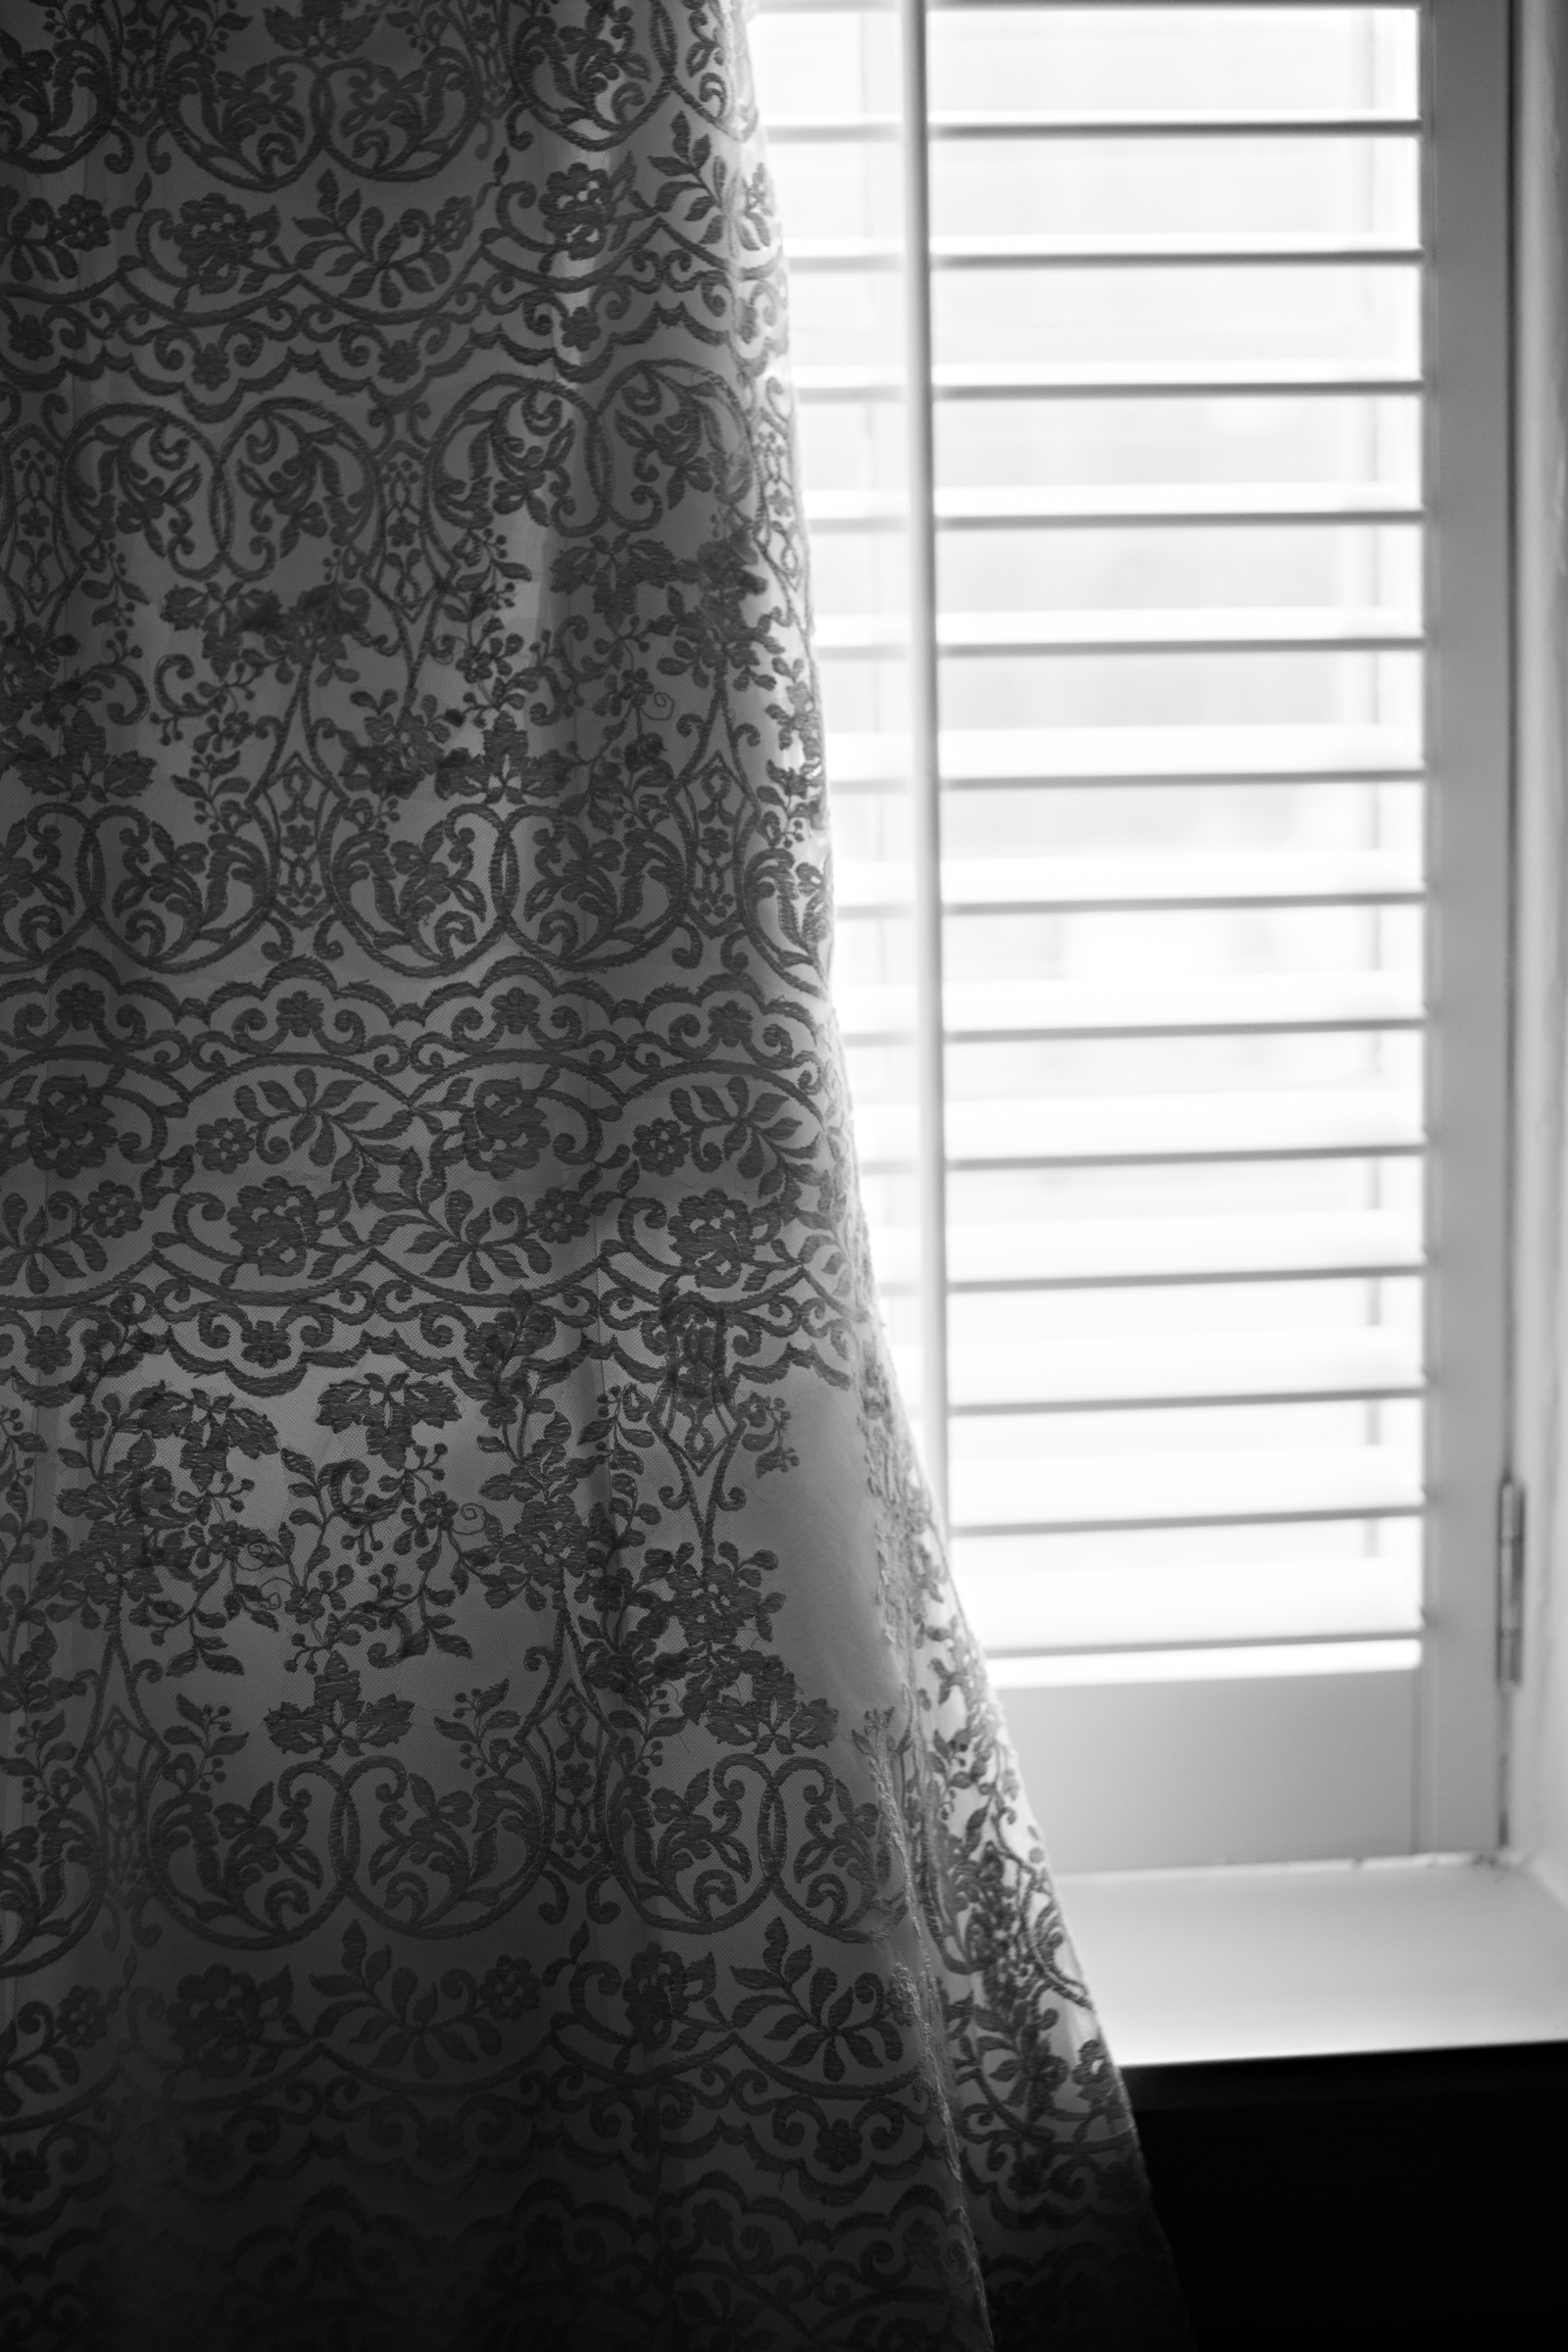 Ni ck-Drollette-Photography-Montgomery-Alabama-Weddings-105.jpg